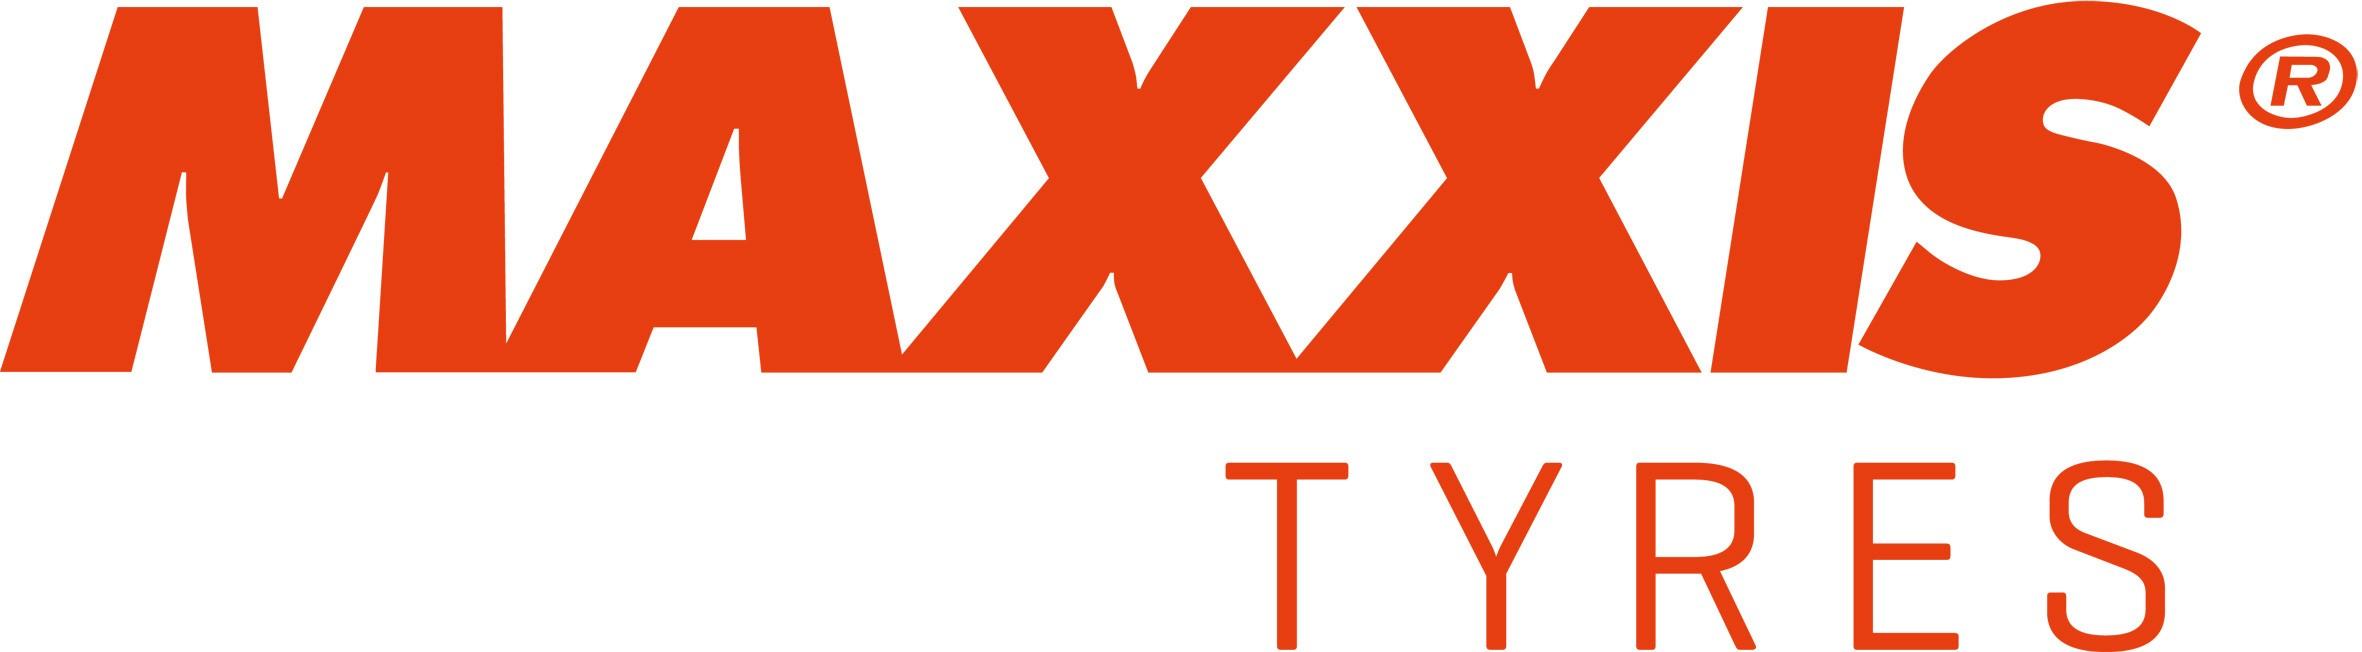 Maxxis Kenya Limited